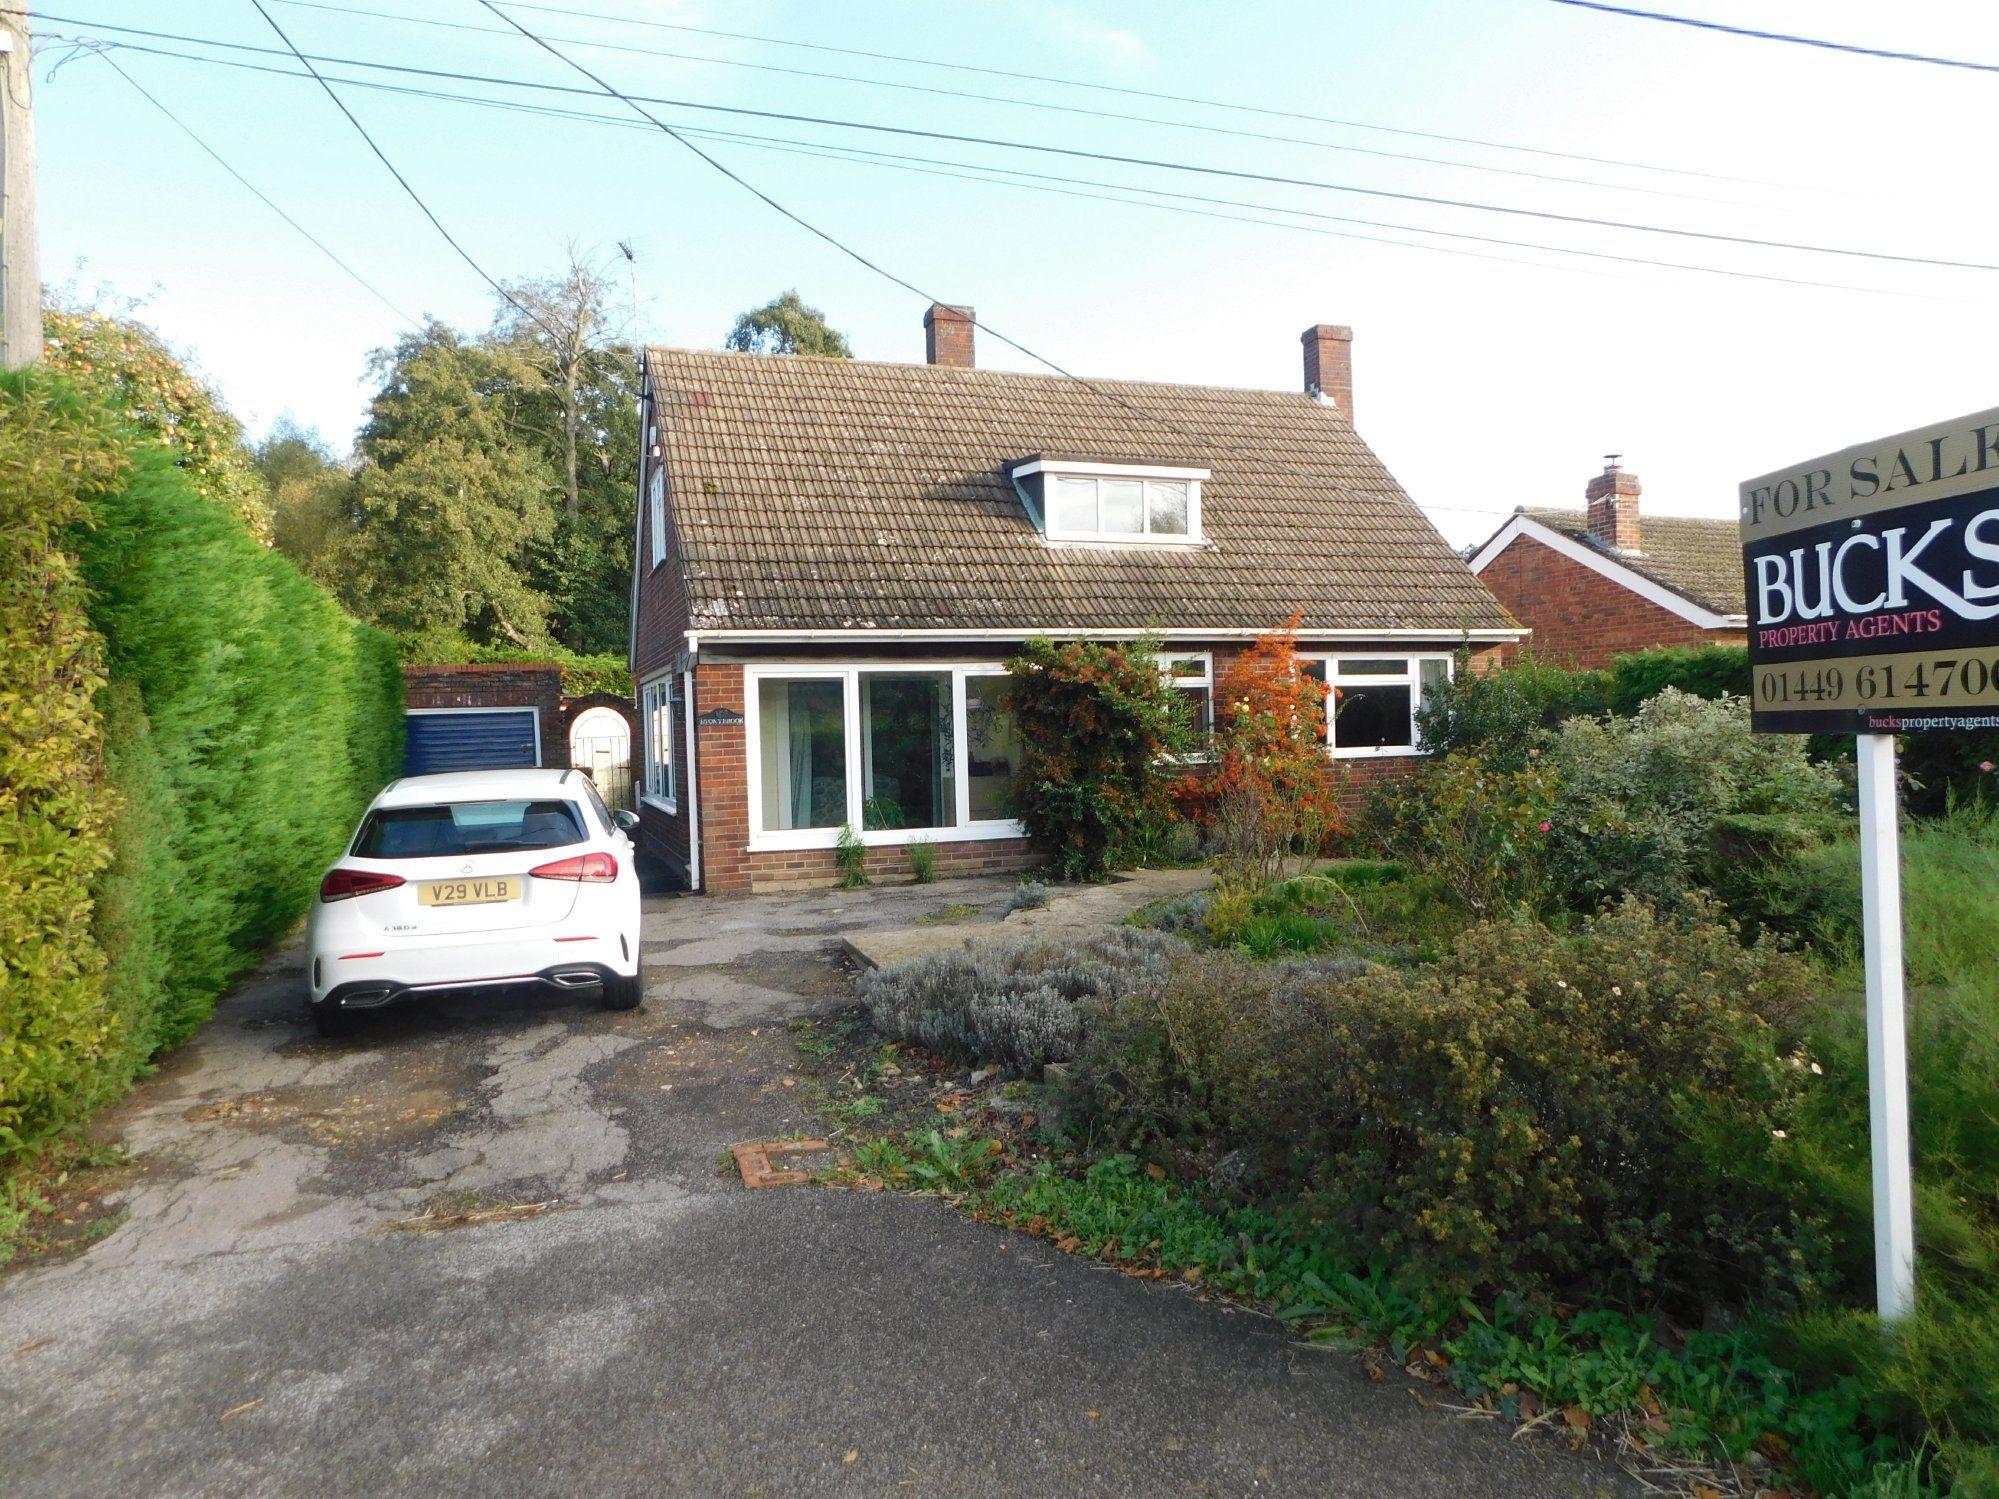 Property photo 1 of 32.